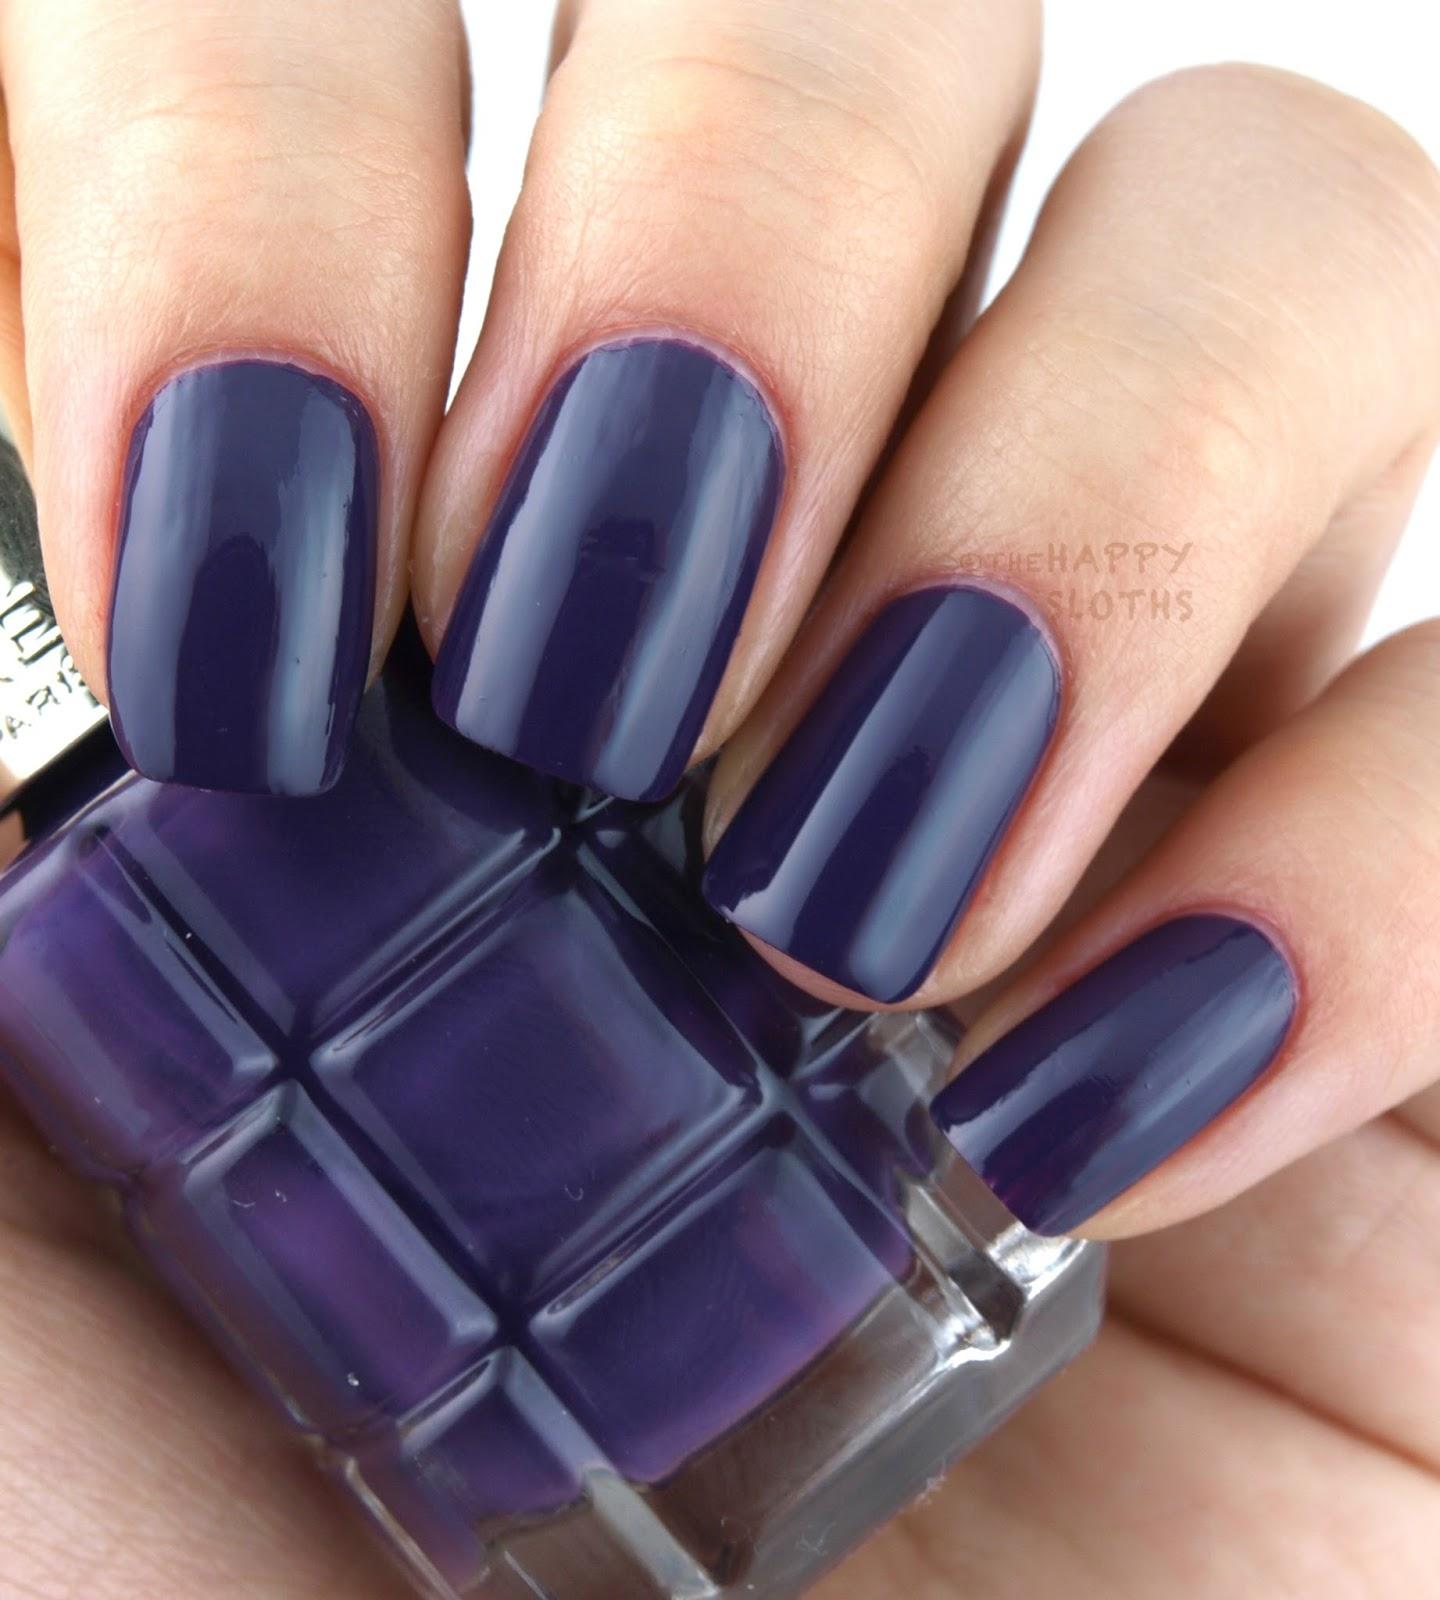 Vernis Nail: L'Oreal Color Riche Le Vernis L'Huile Nail Polish: Review